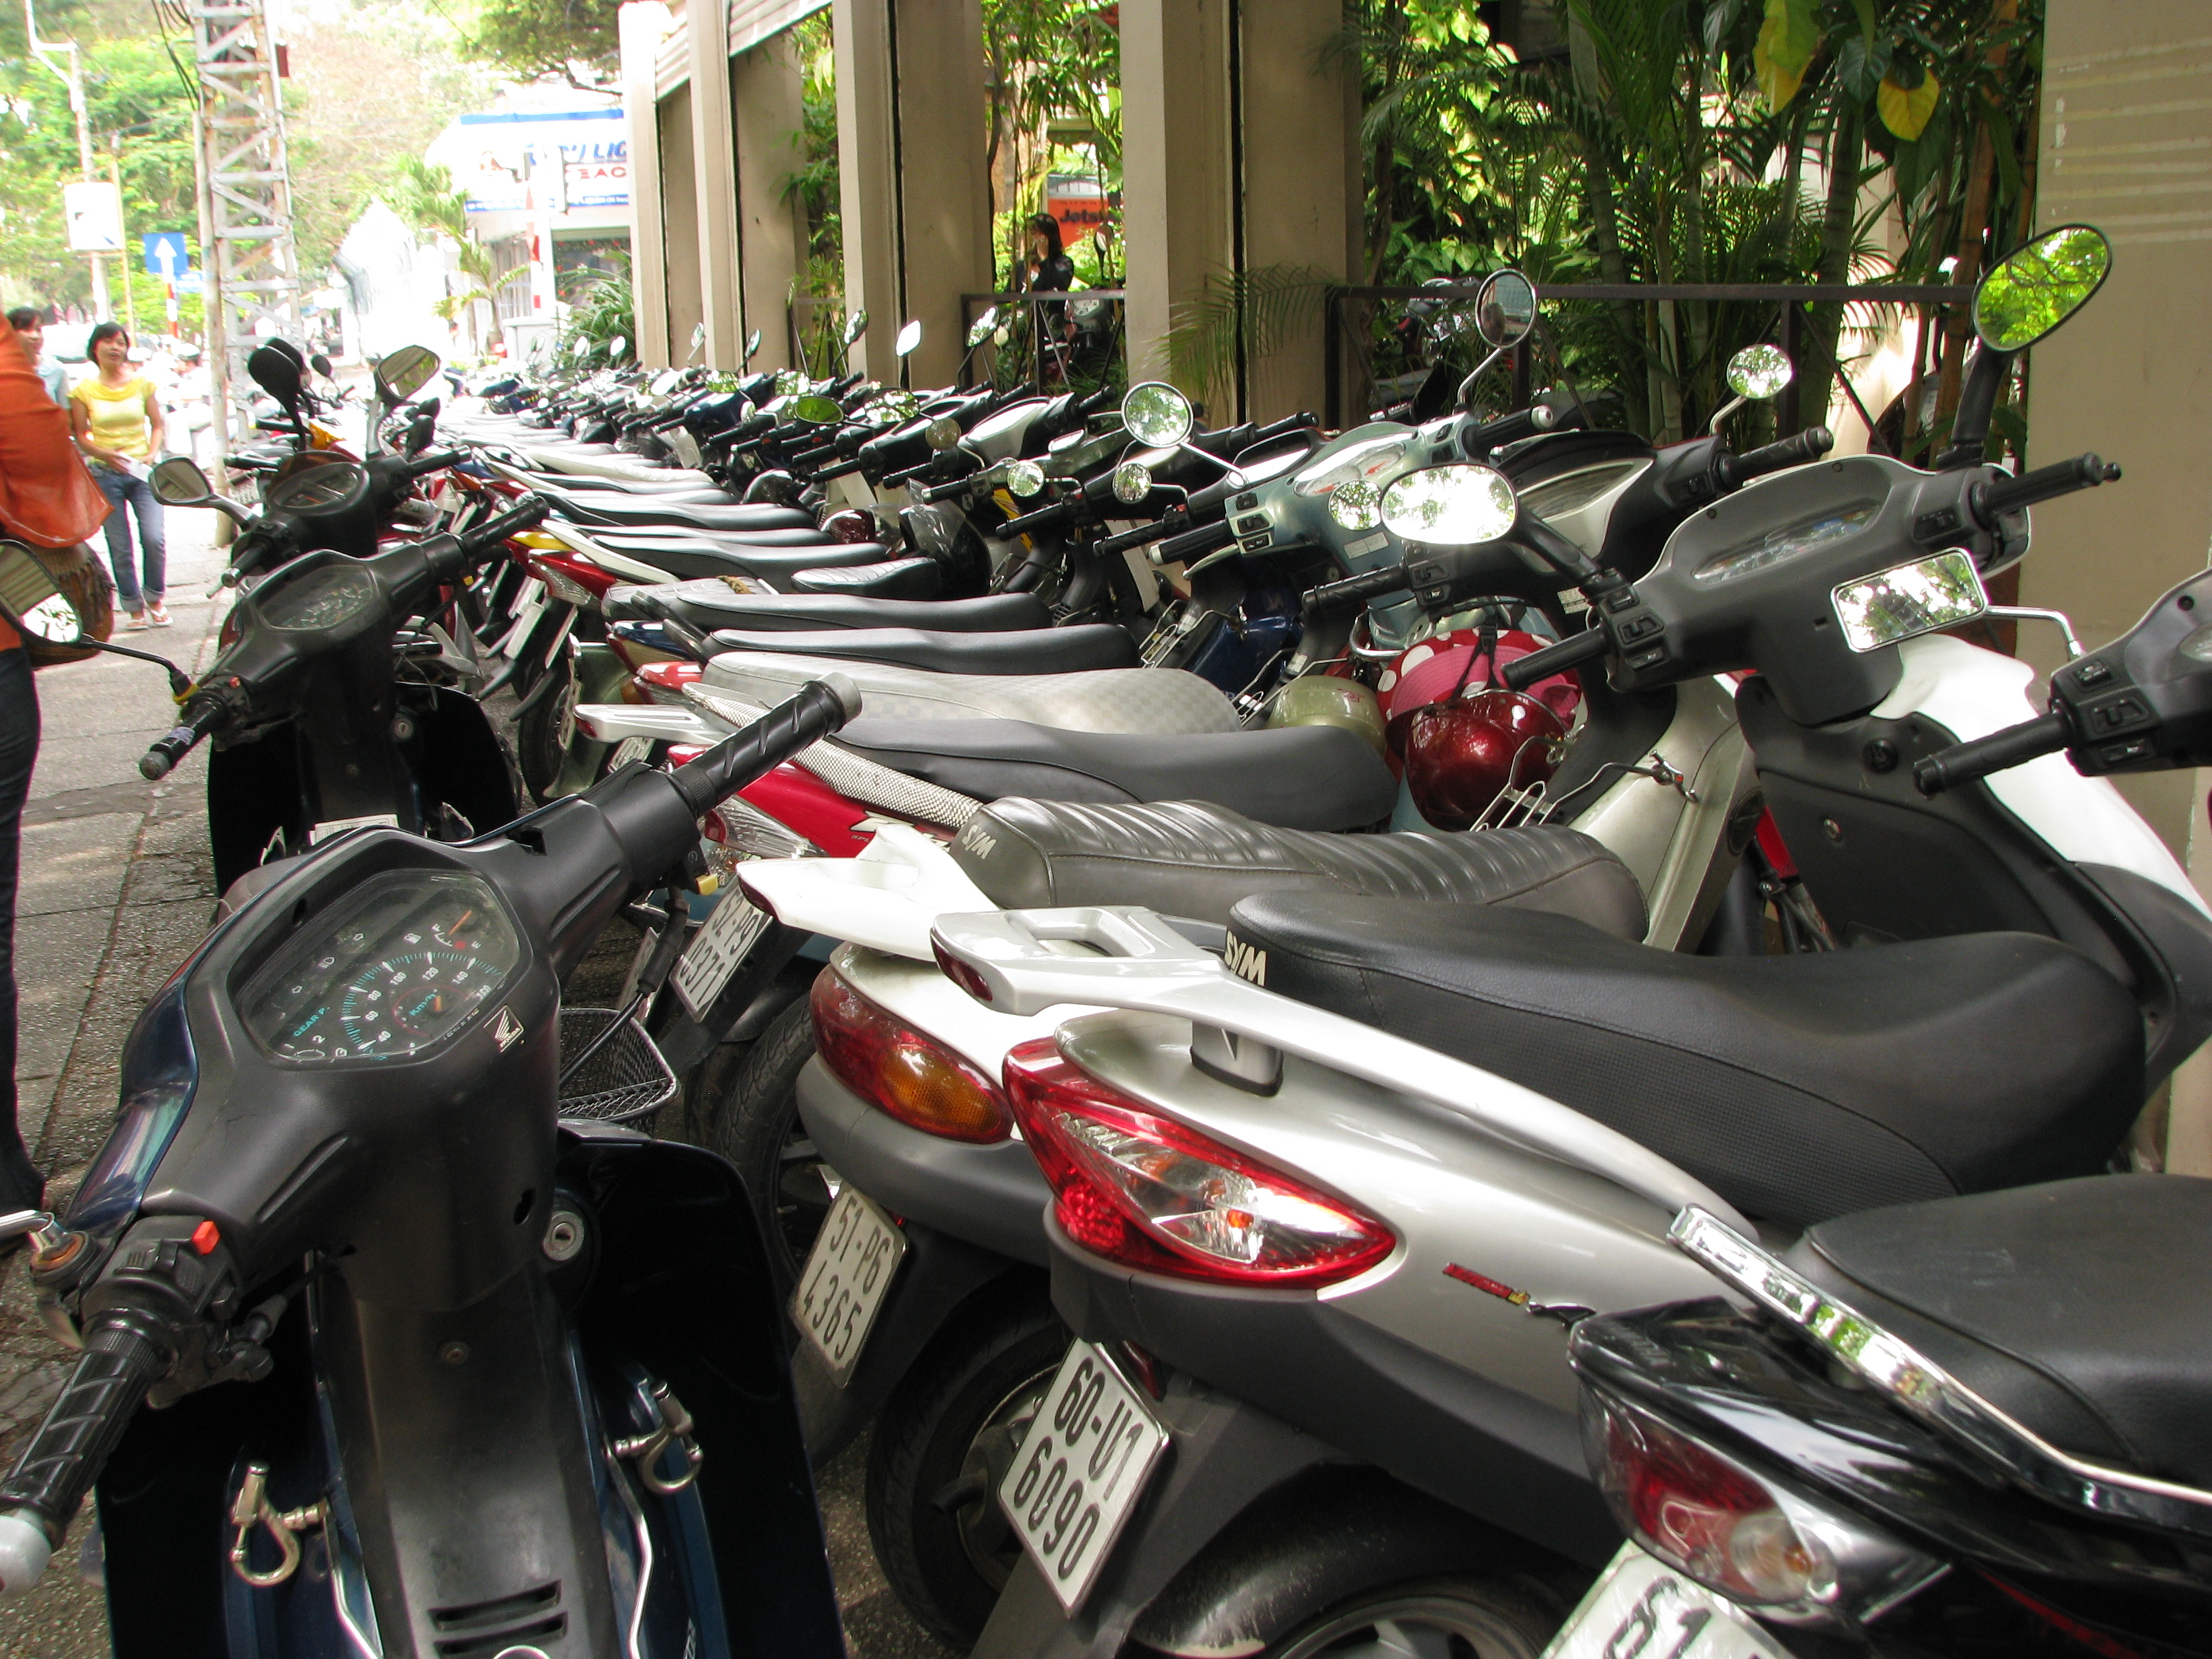 http://upload.wikimedia.org/wikipedia/commons/9/99/Vietnam_08_-_73_-_Saigon_motorcycles_parked_%283170534189%29.jpg